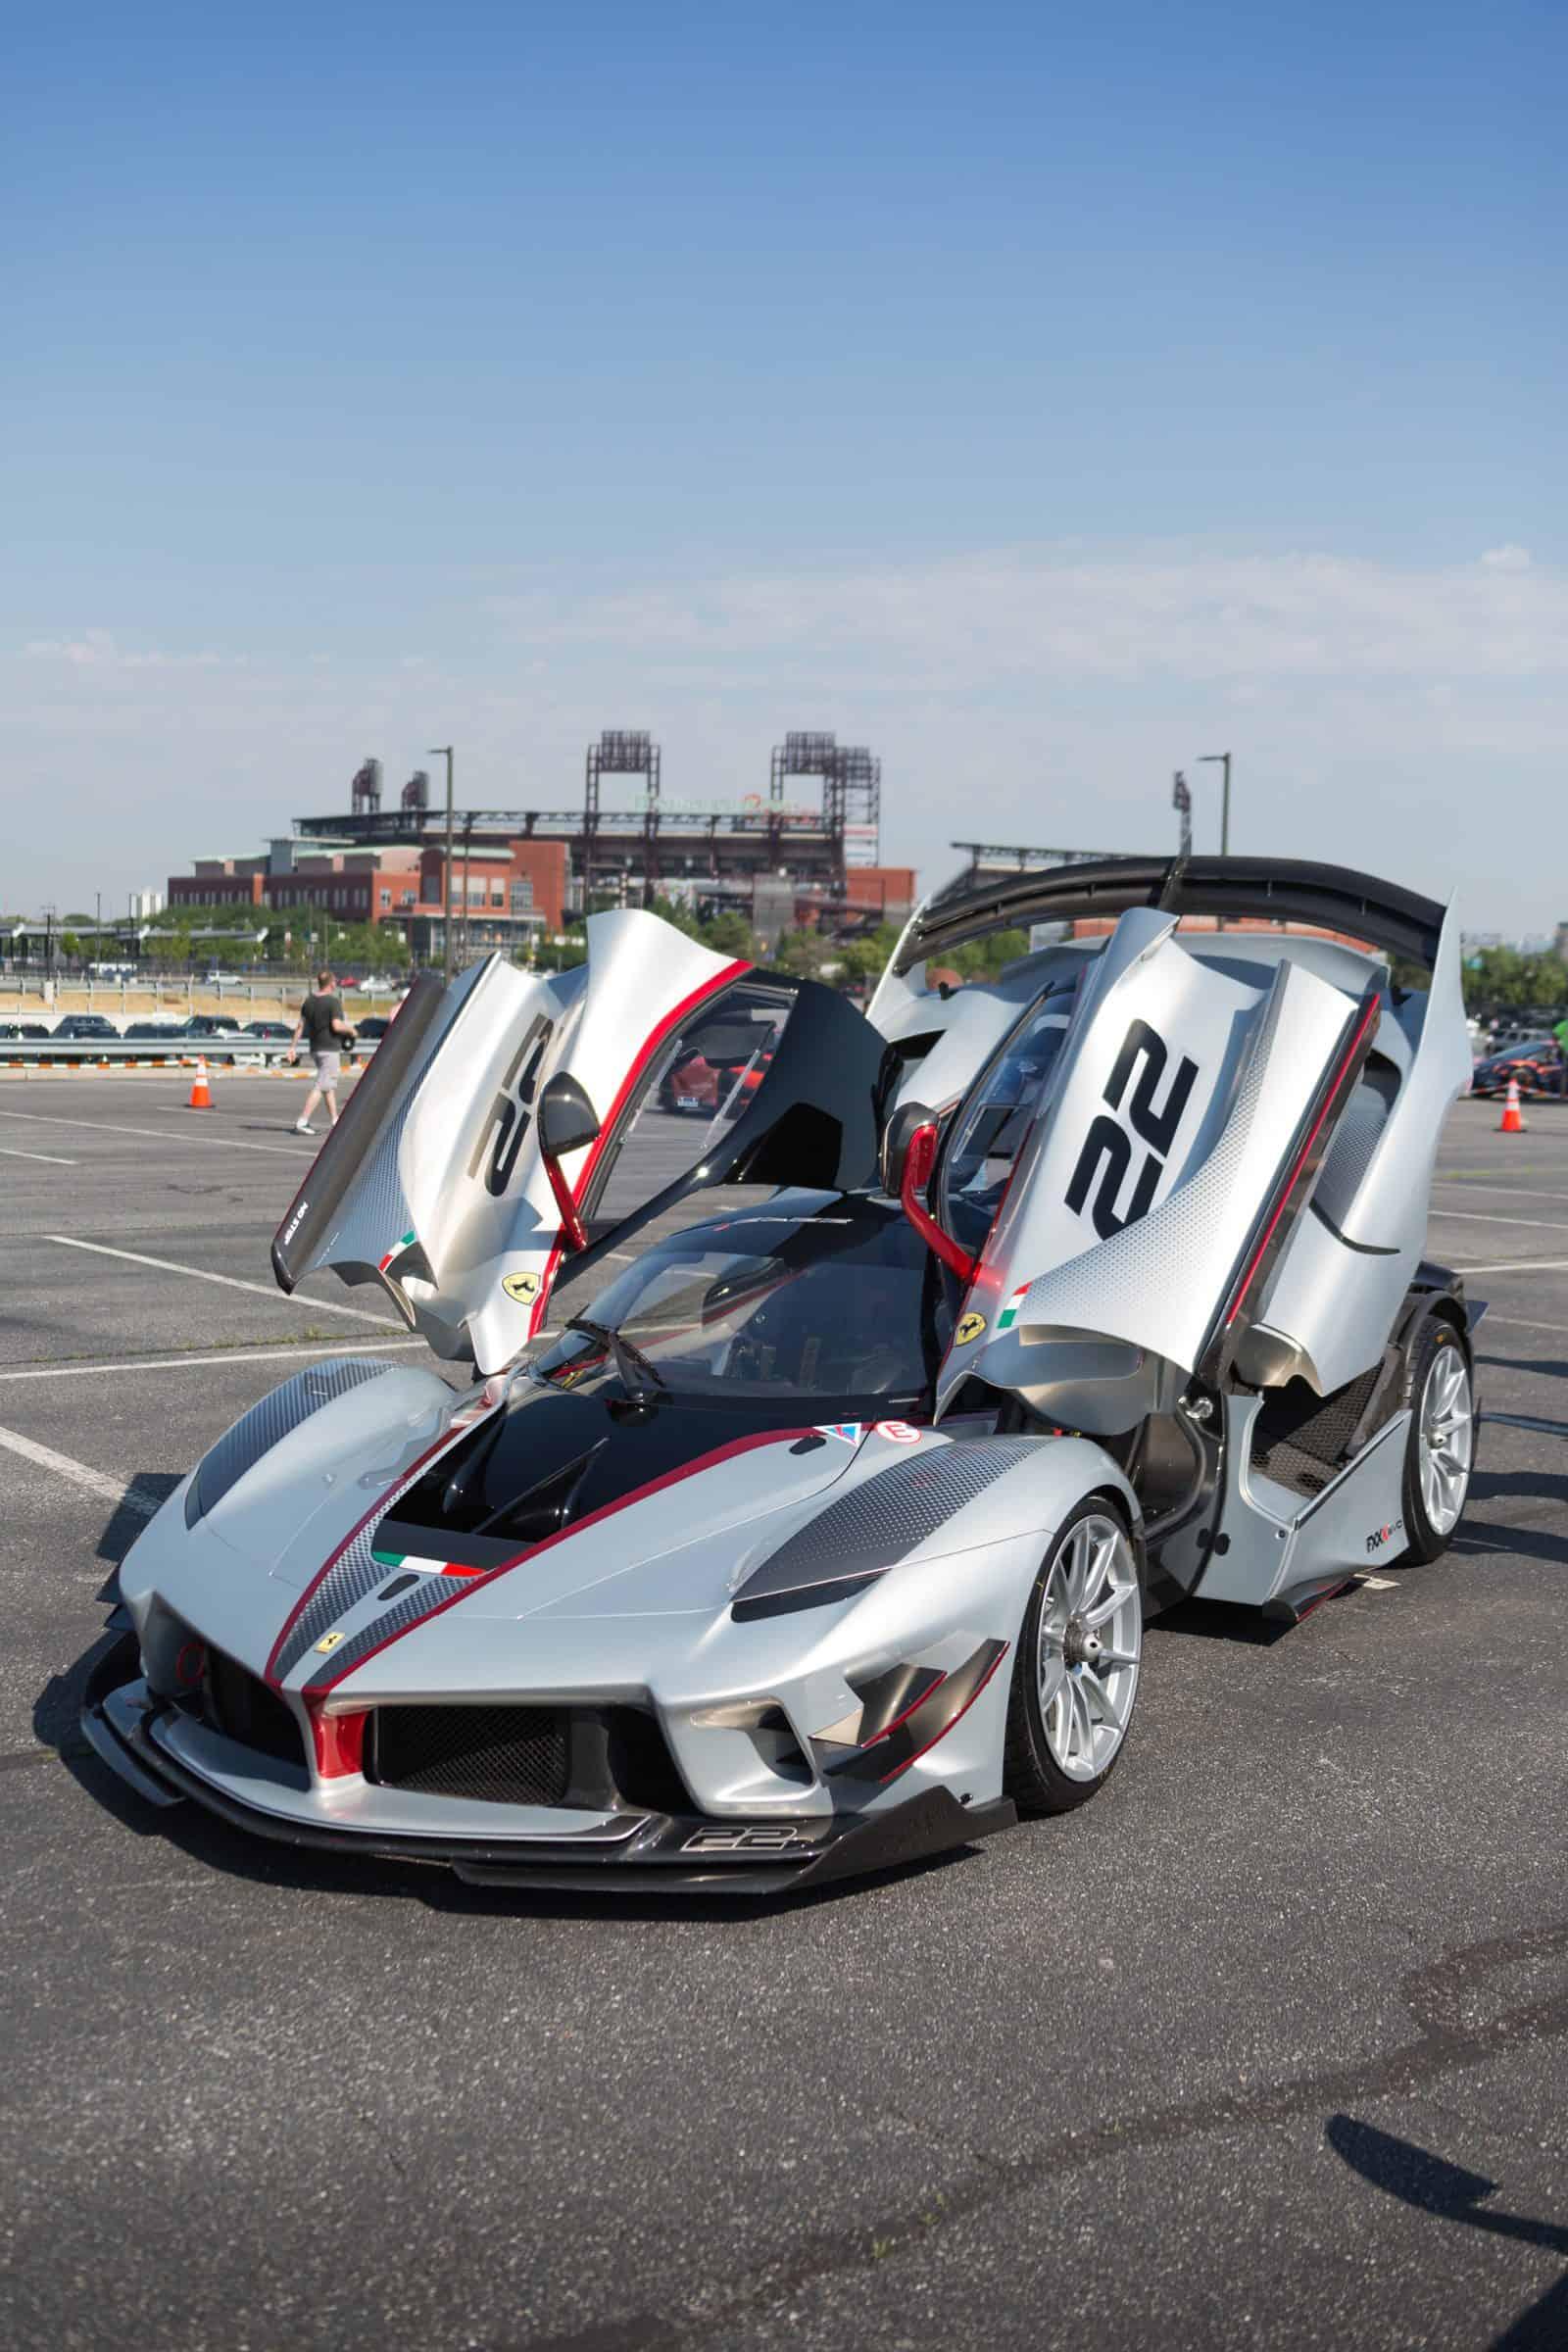 Ferrari FXXK in the Supercar show near Philly stadiums